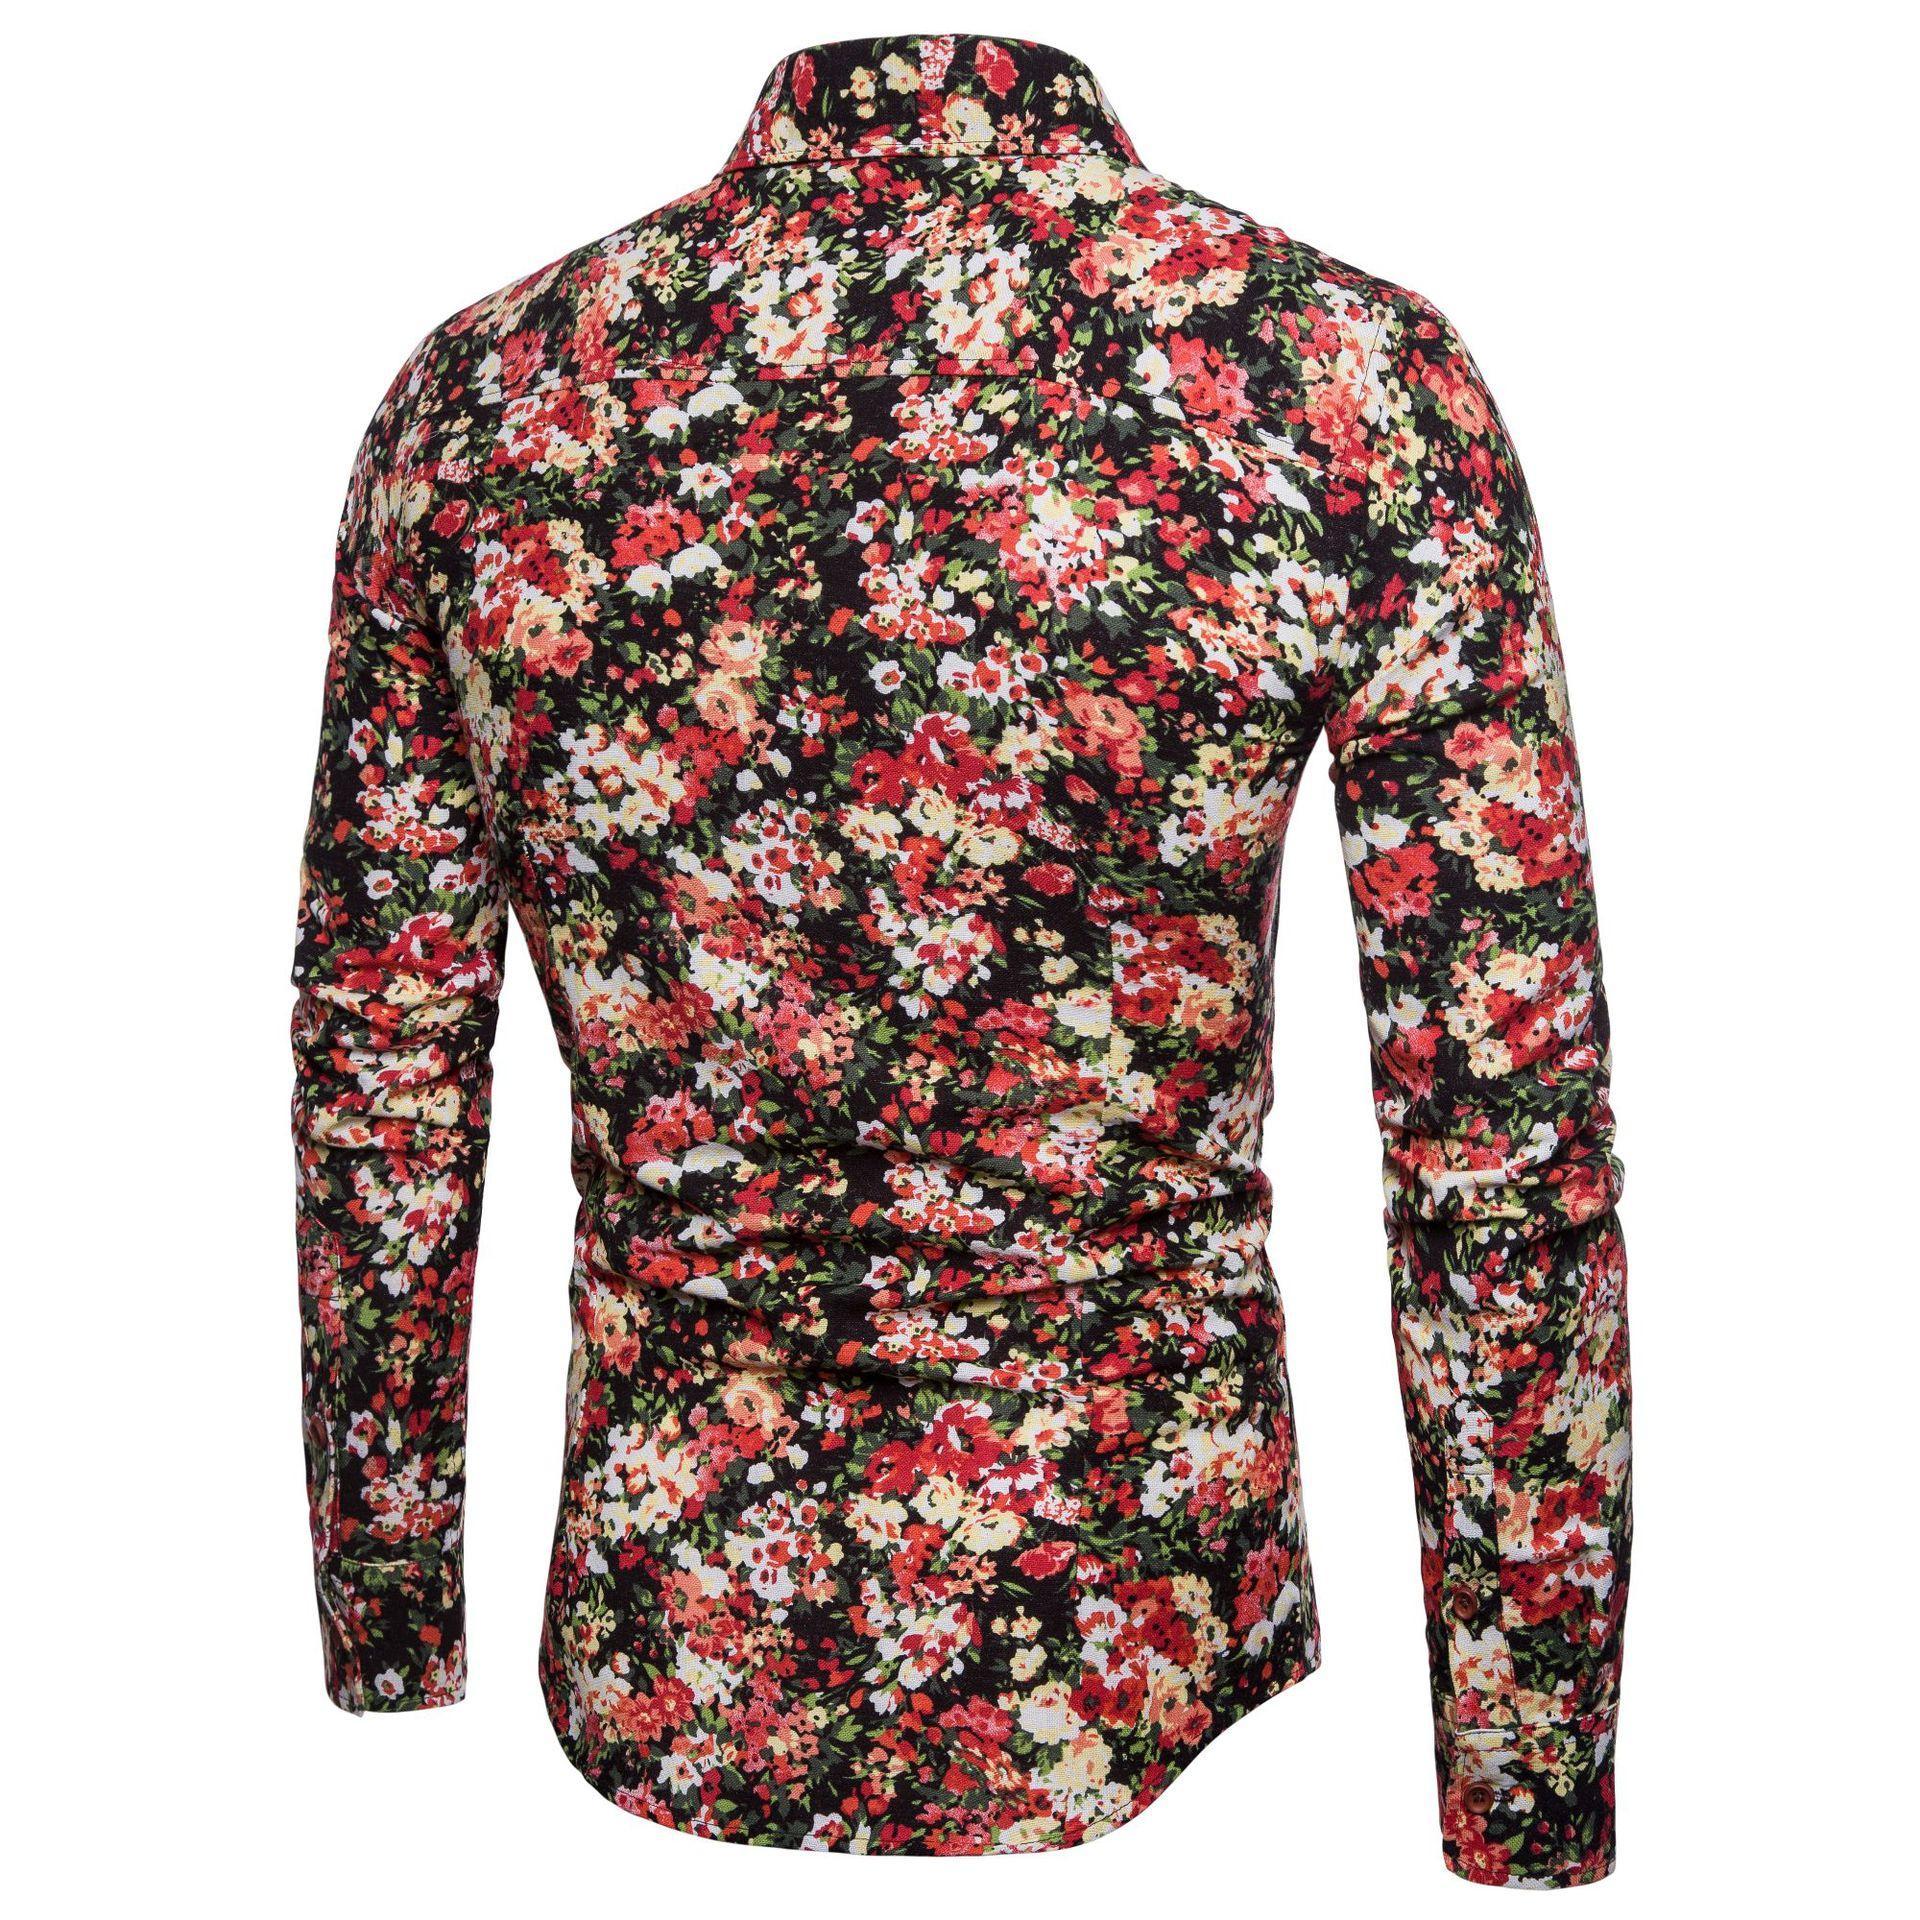 Social Shirt Men 39 s clothing Hawaiian Blouse Male Casual Floral Shirts Men Linen Long sleeve Slim New in Casual Shirts from Men 39 s Clothing